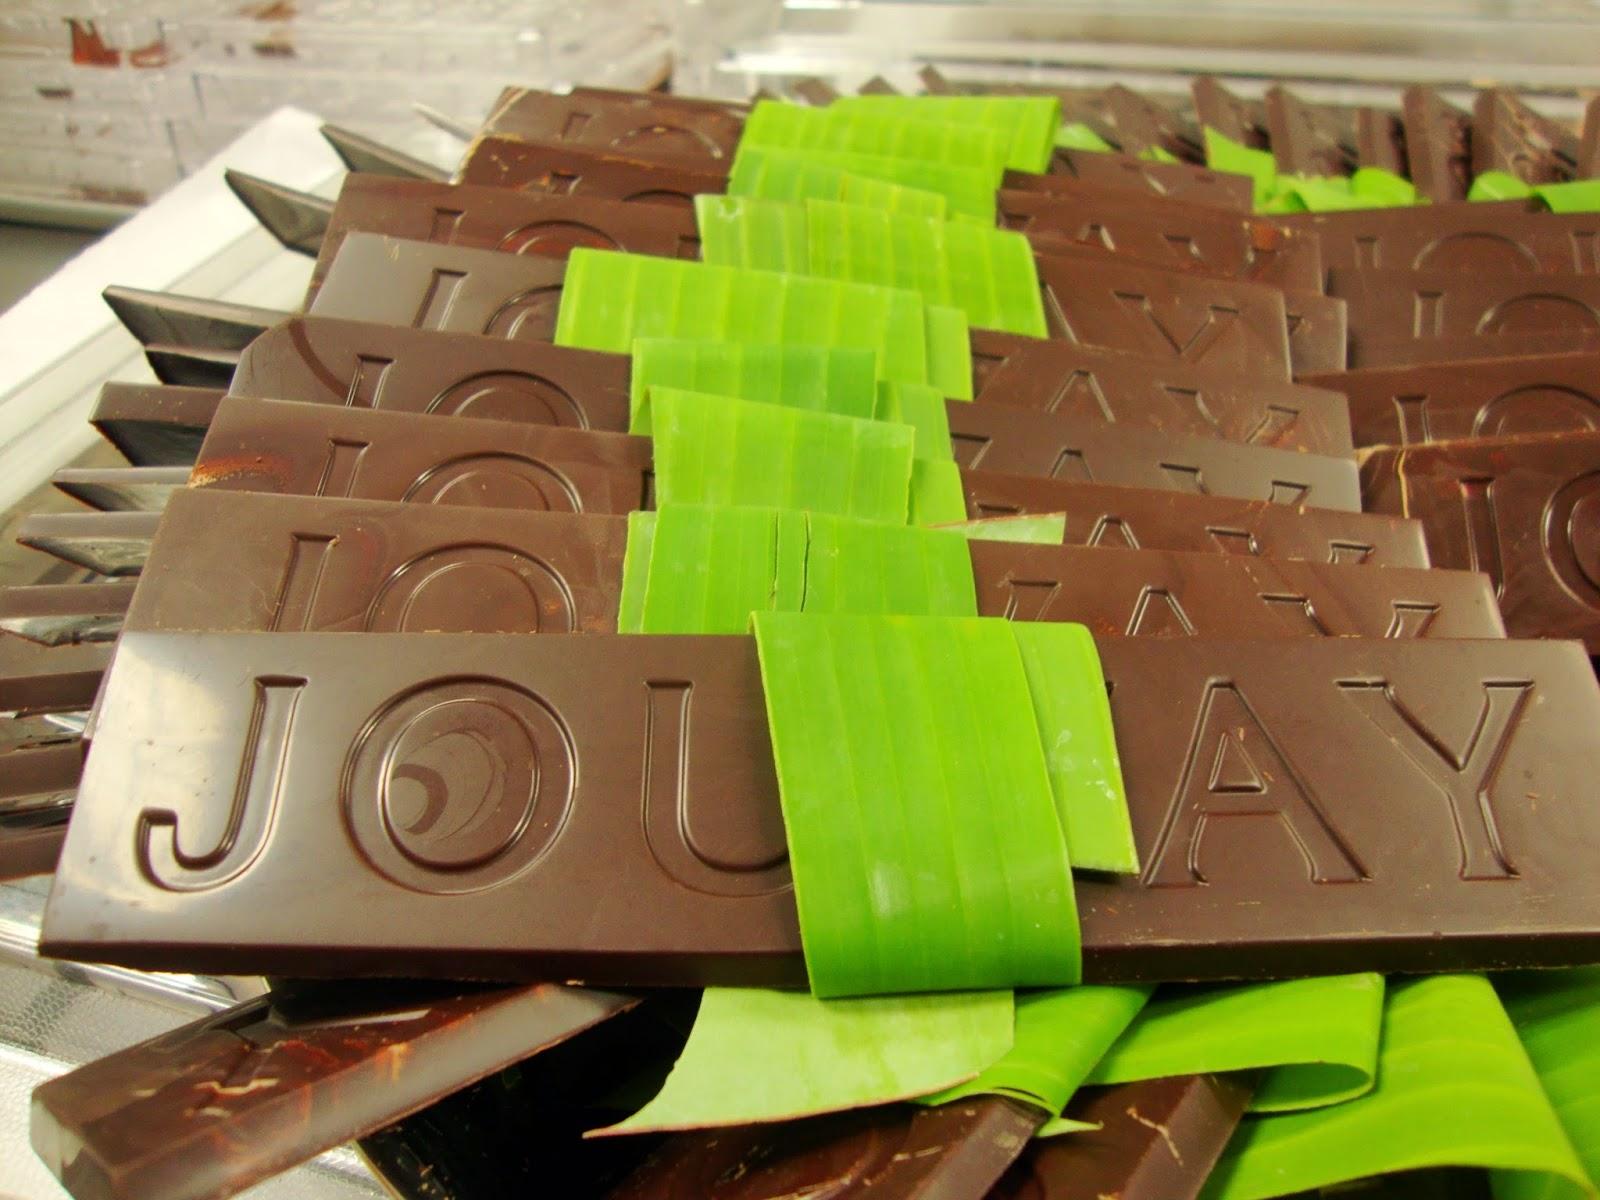 Diamond Chocolate Factory In Grenada